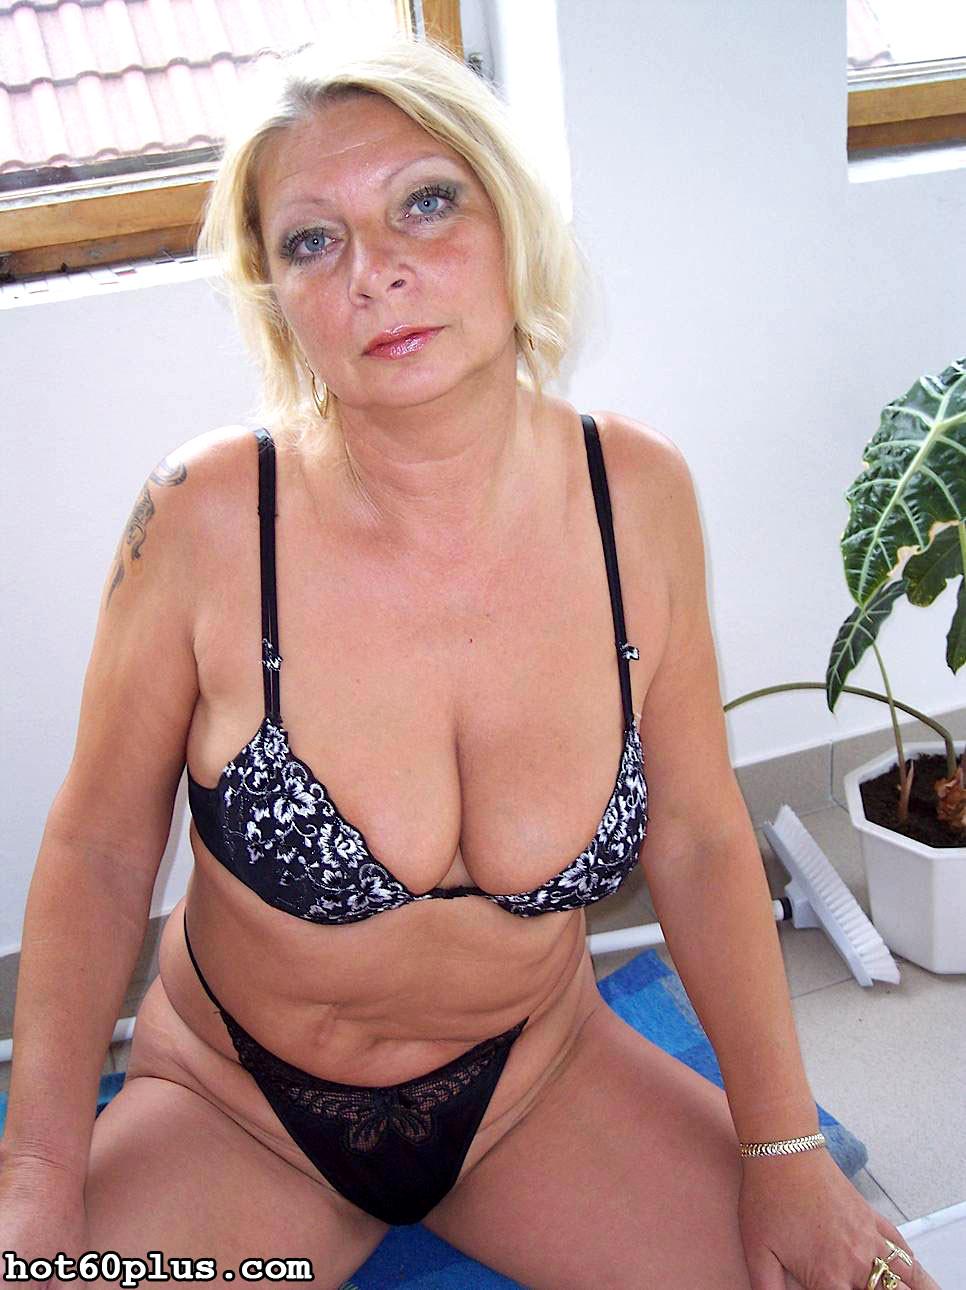 She's fine babe porn thread sexy